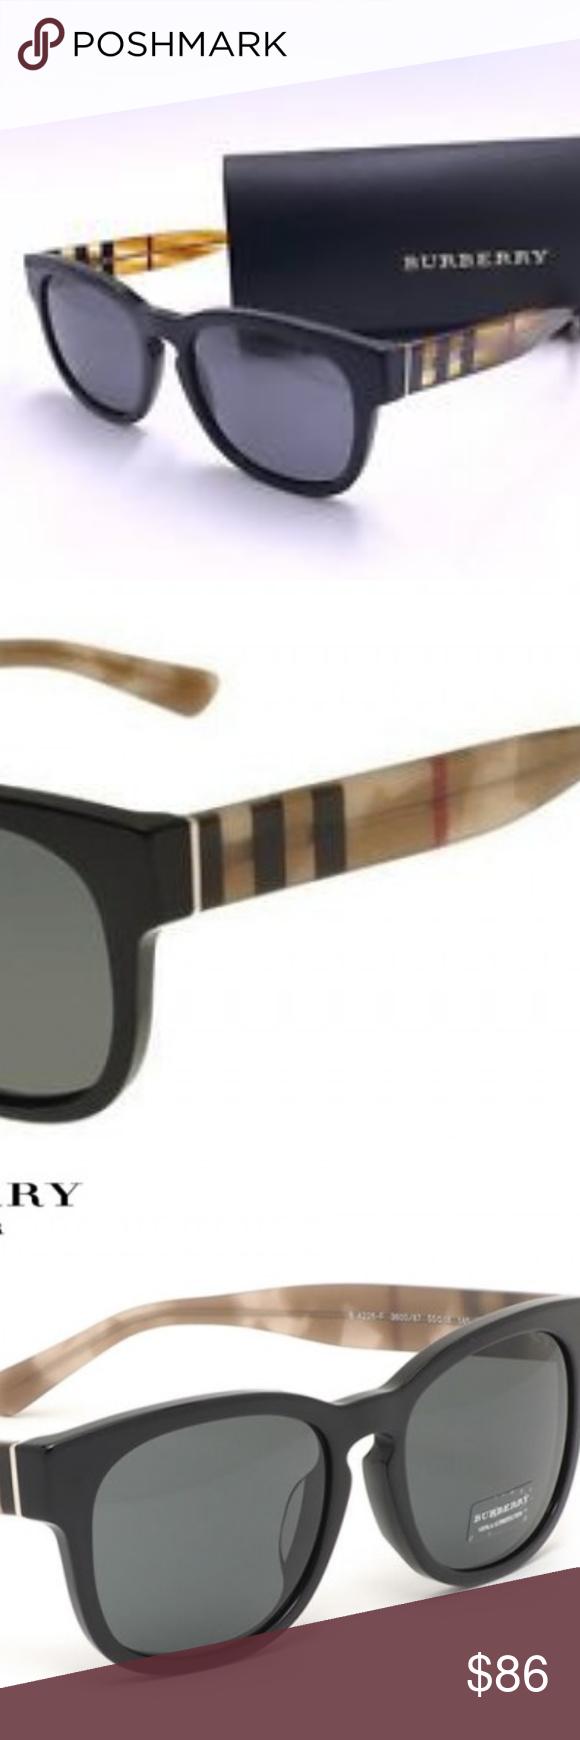 019b9a1b6b53 Burberry b4226 unisex polarized sunglasses